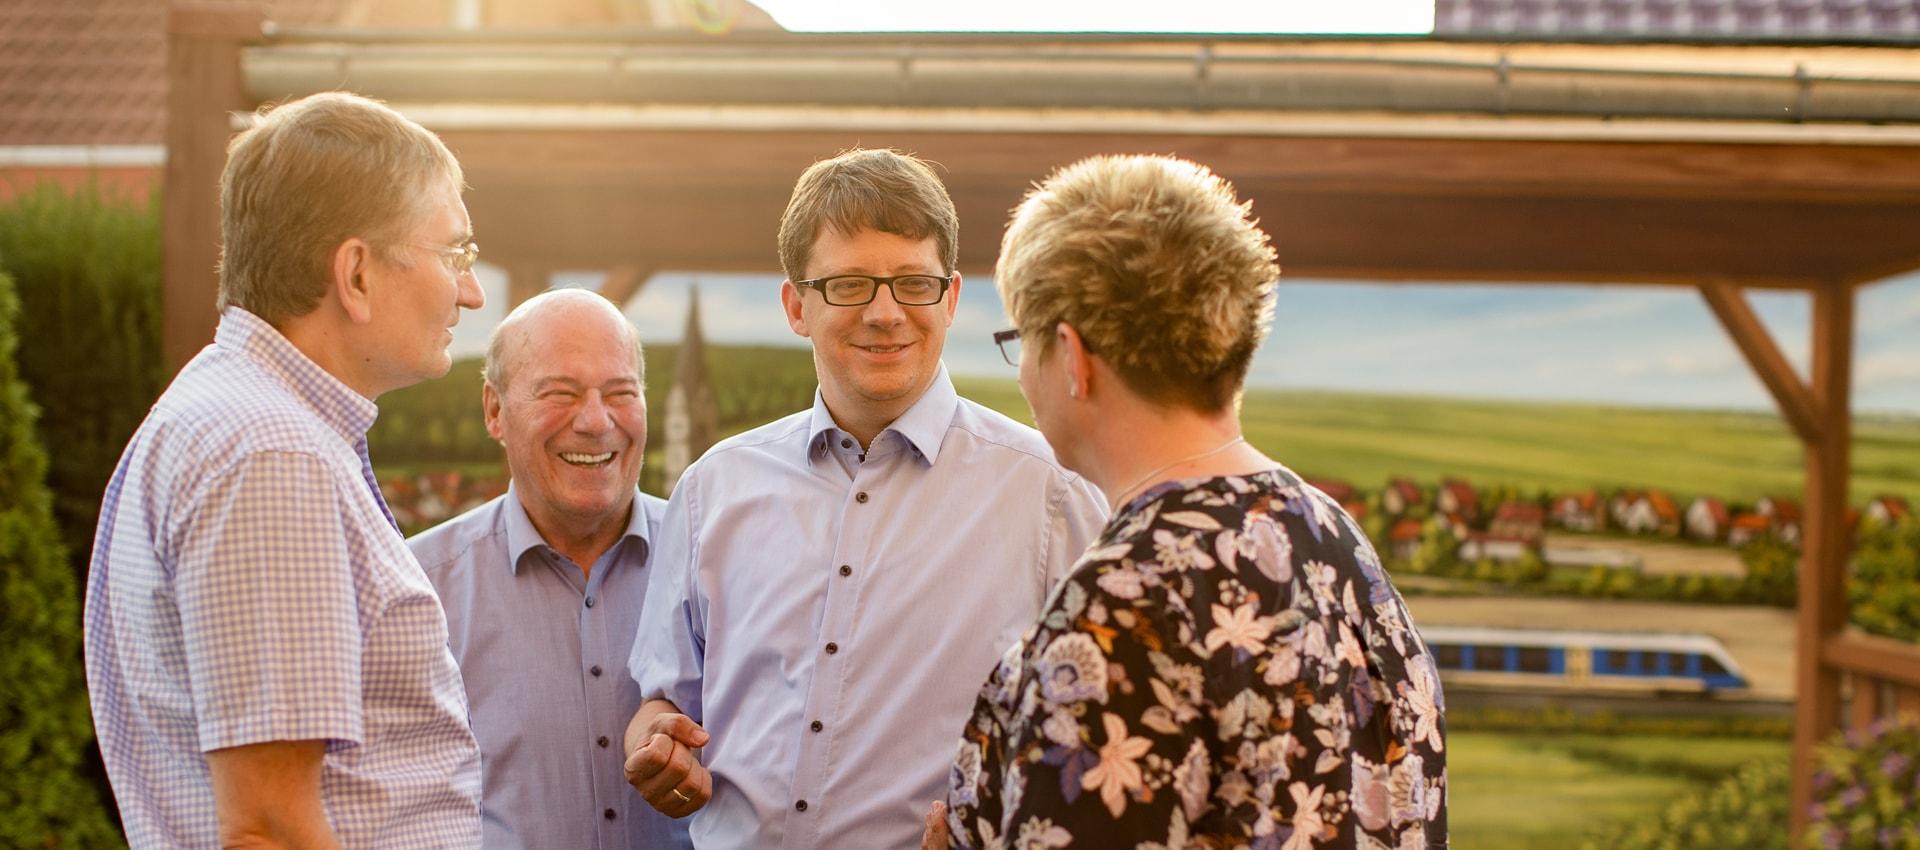 Björn Gryschka unabhängig Kandidat Bürgermeister Bad Salzdetfurth